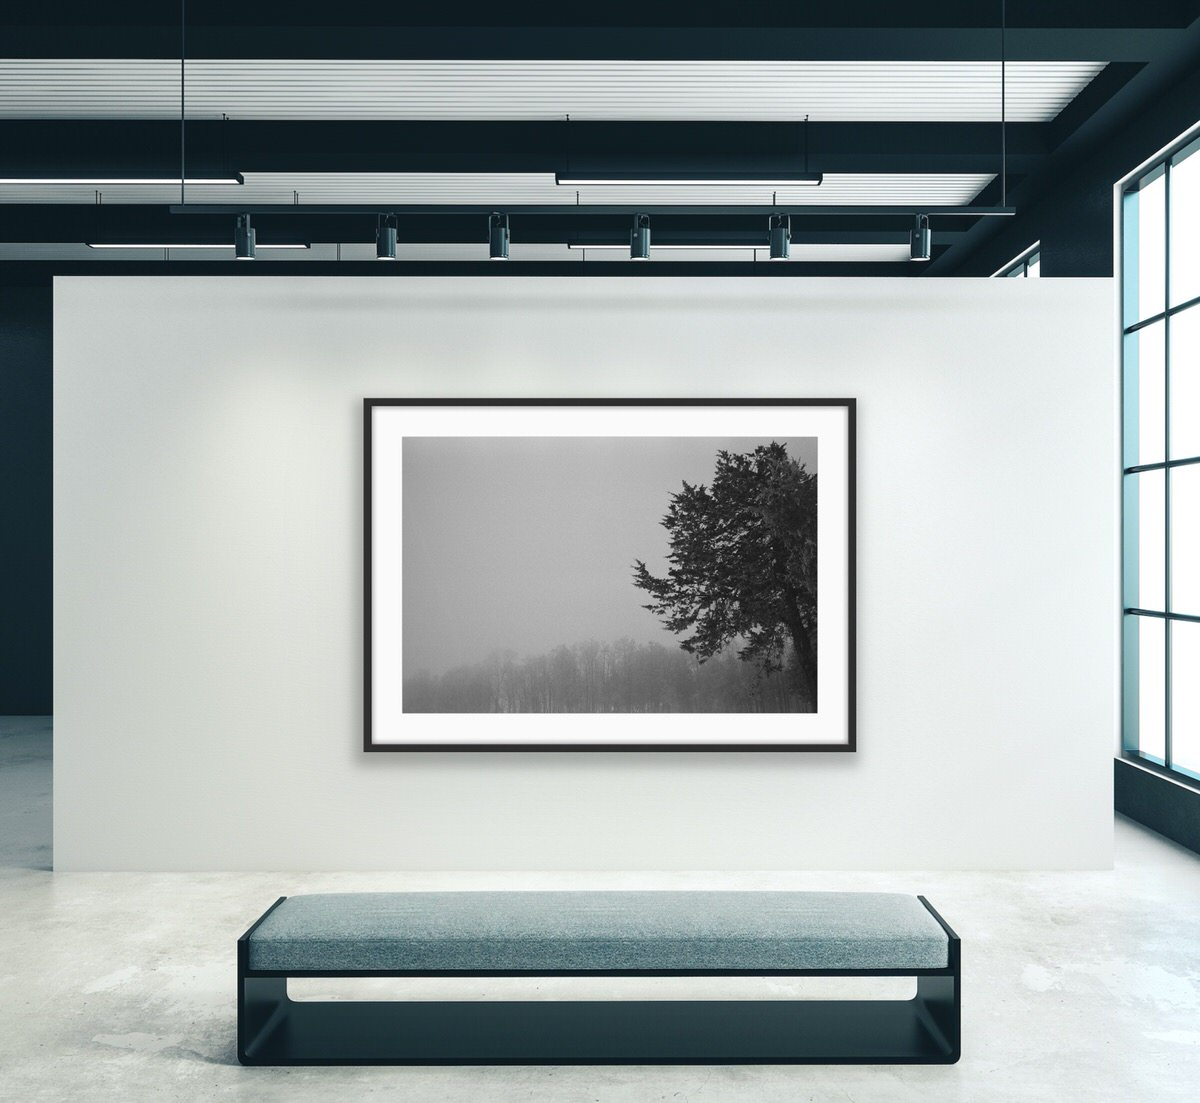 Black-and-white-fine-art-film-photography-wall-decor-by-emerging-artist-Studio-L-photographer-Laura-Schneider-_7851